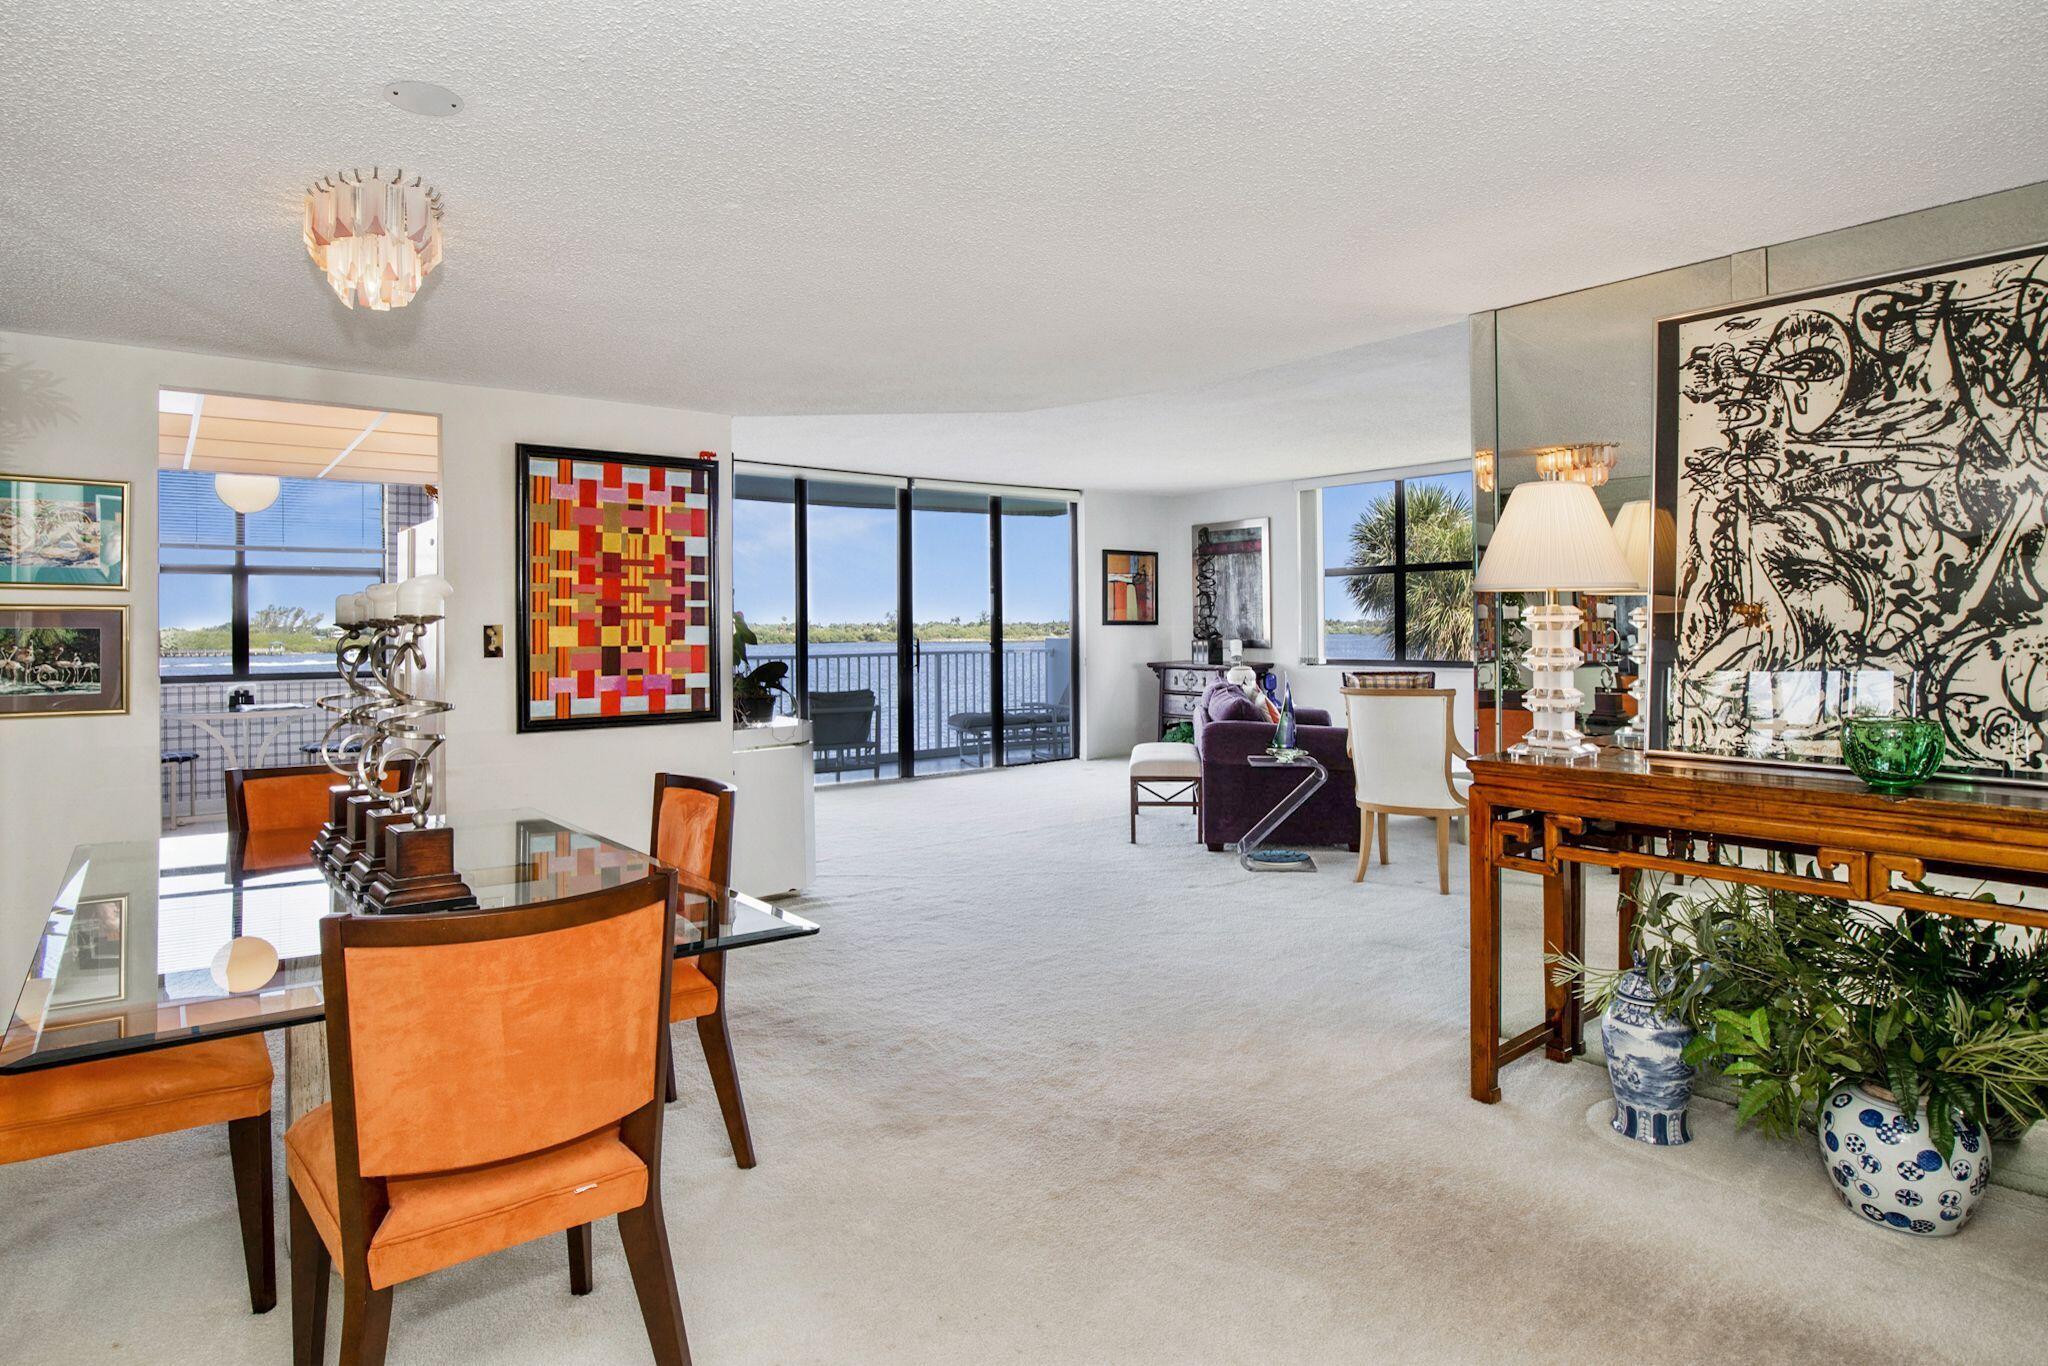 Home for sale in La Palma Palm Beach Florida